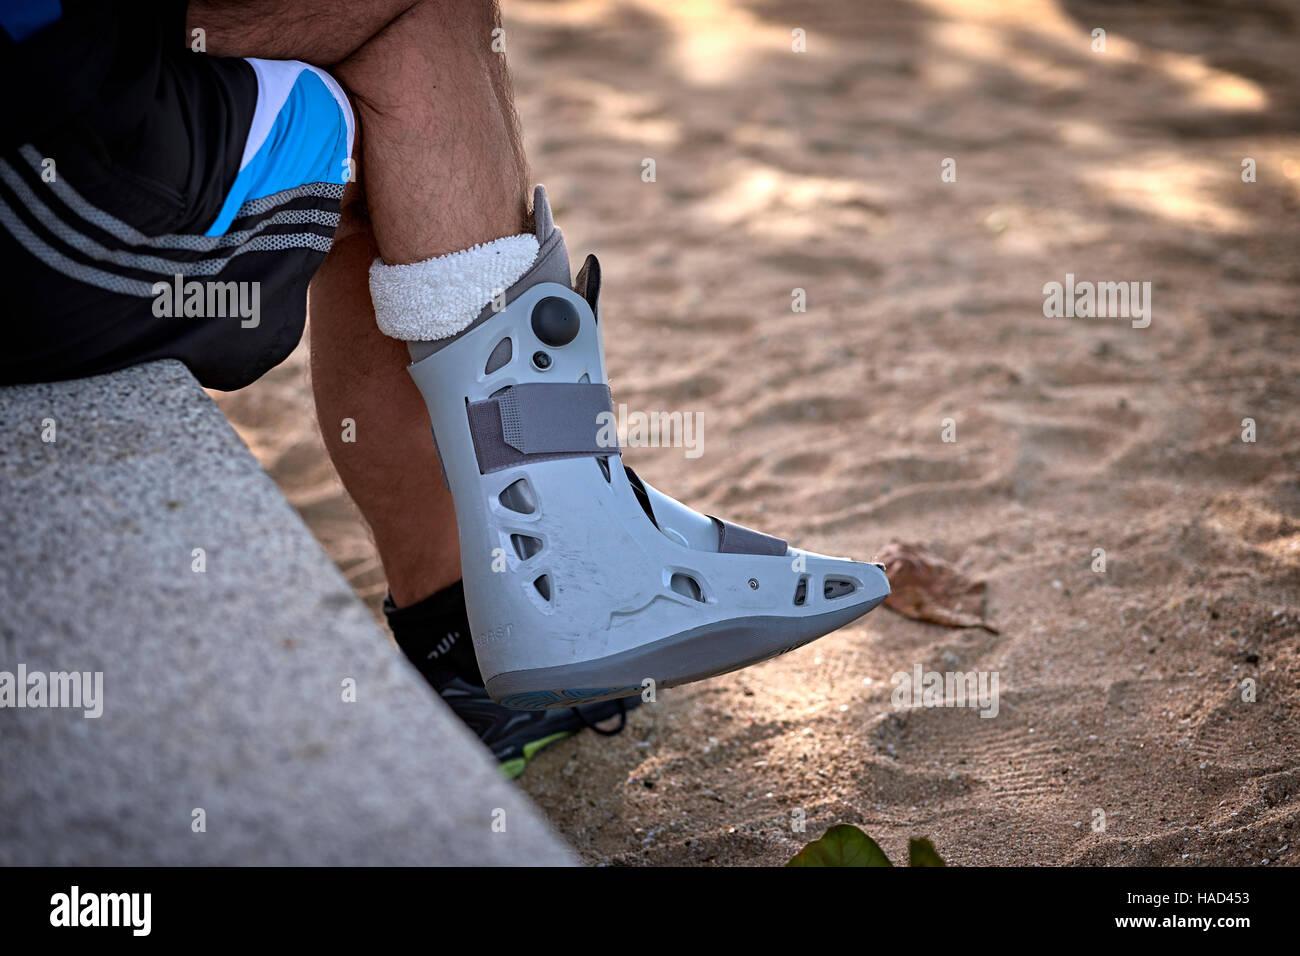 Ankle Injury Stockfotos & Ankle Injury Bilder - Alamy